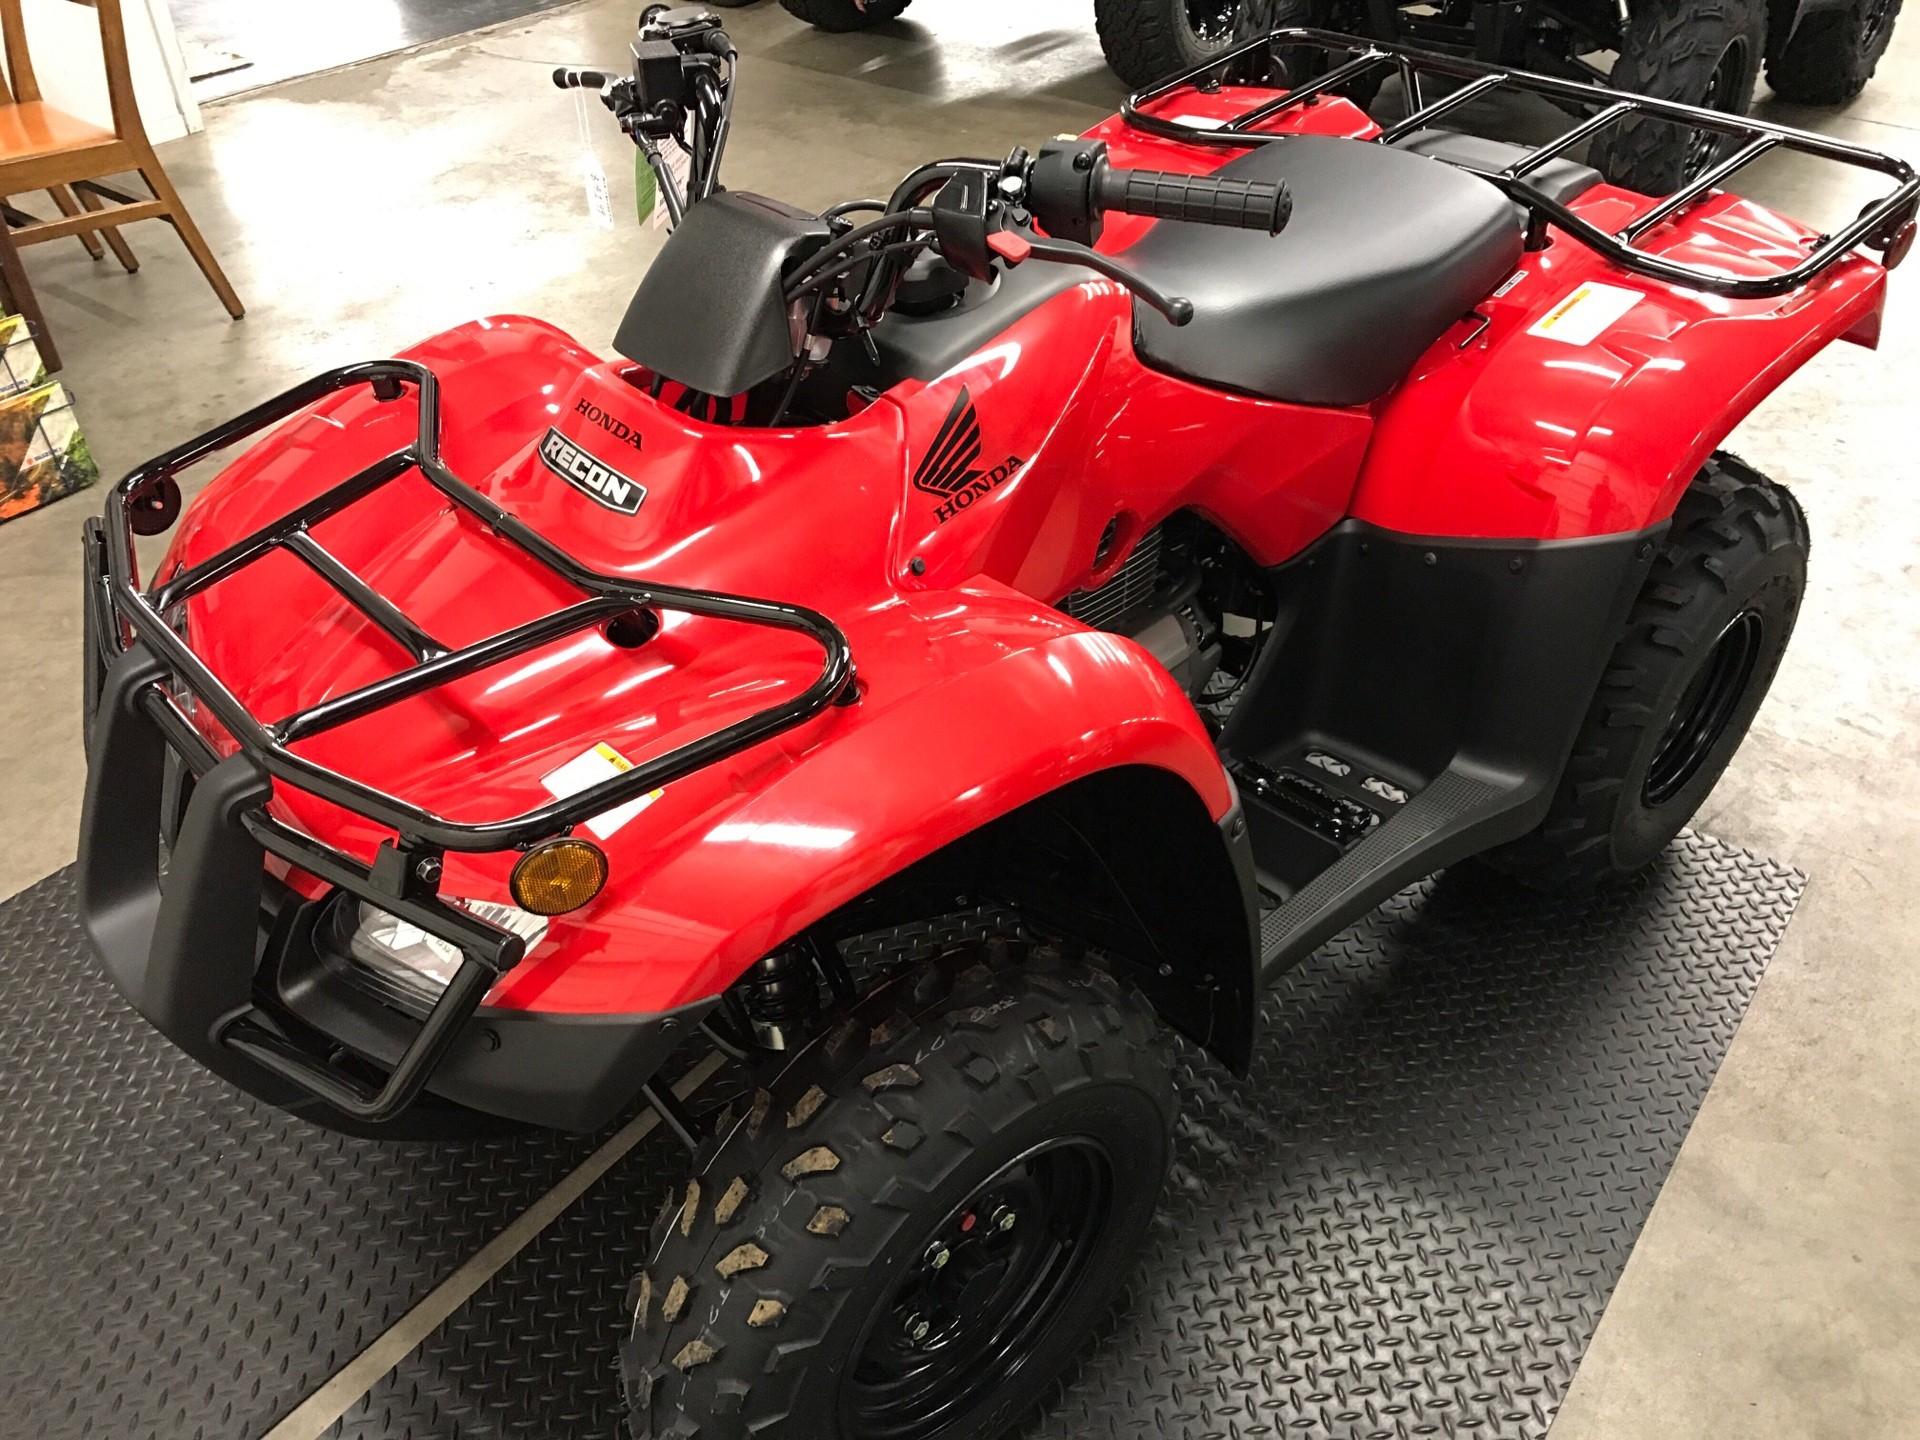 2019 Honda FourTrax Recon 1